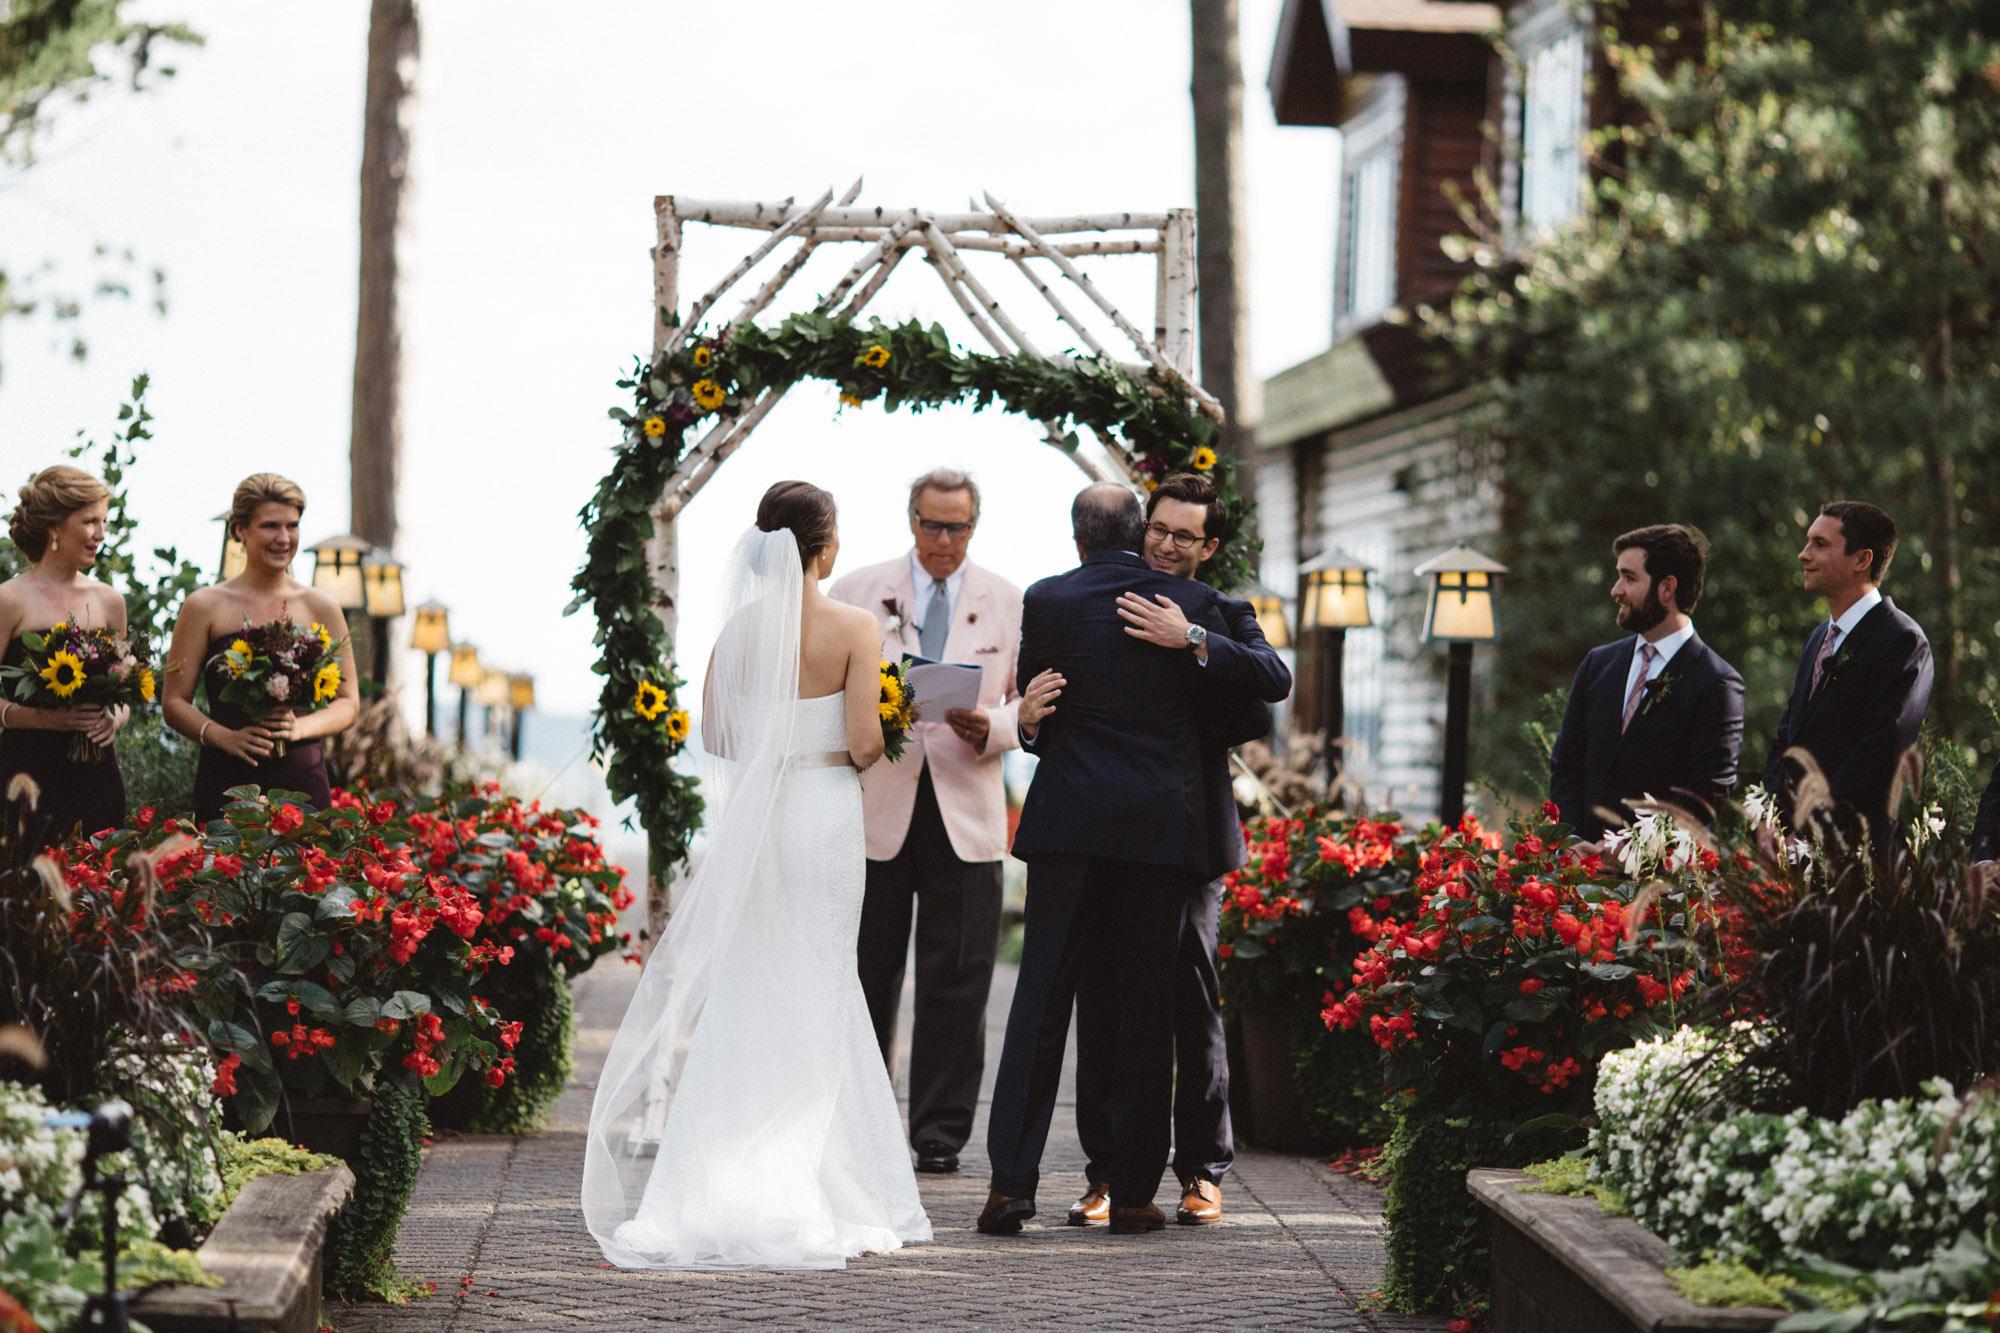 Father giving away bride to groom at wedding ceremony. Photography by Britt DeZeeuw, Brainerd Minnesota photographer